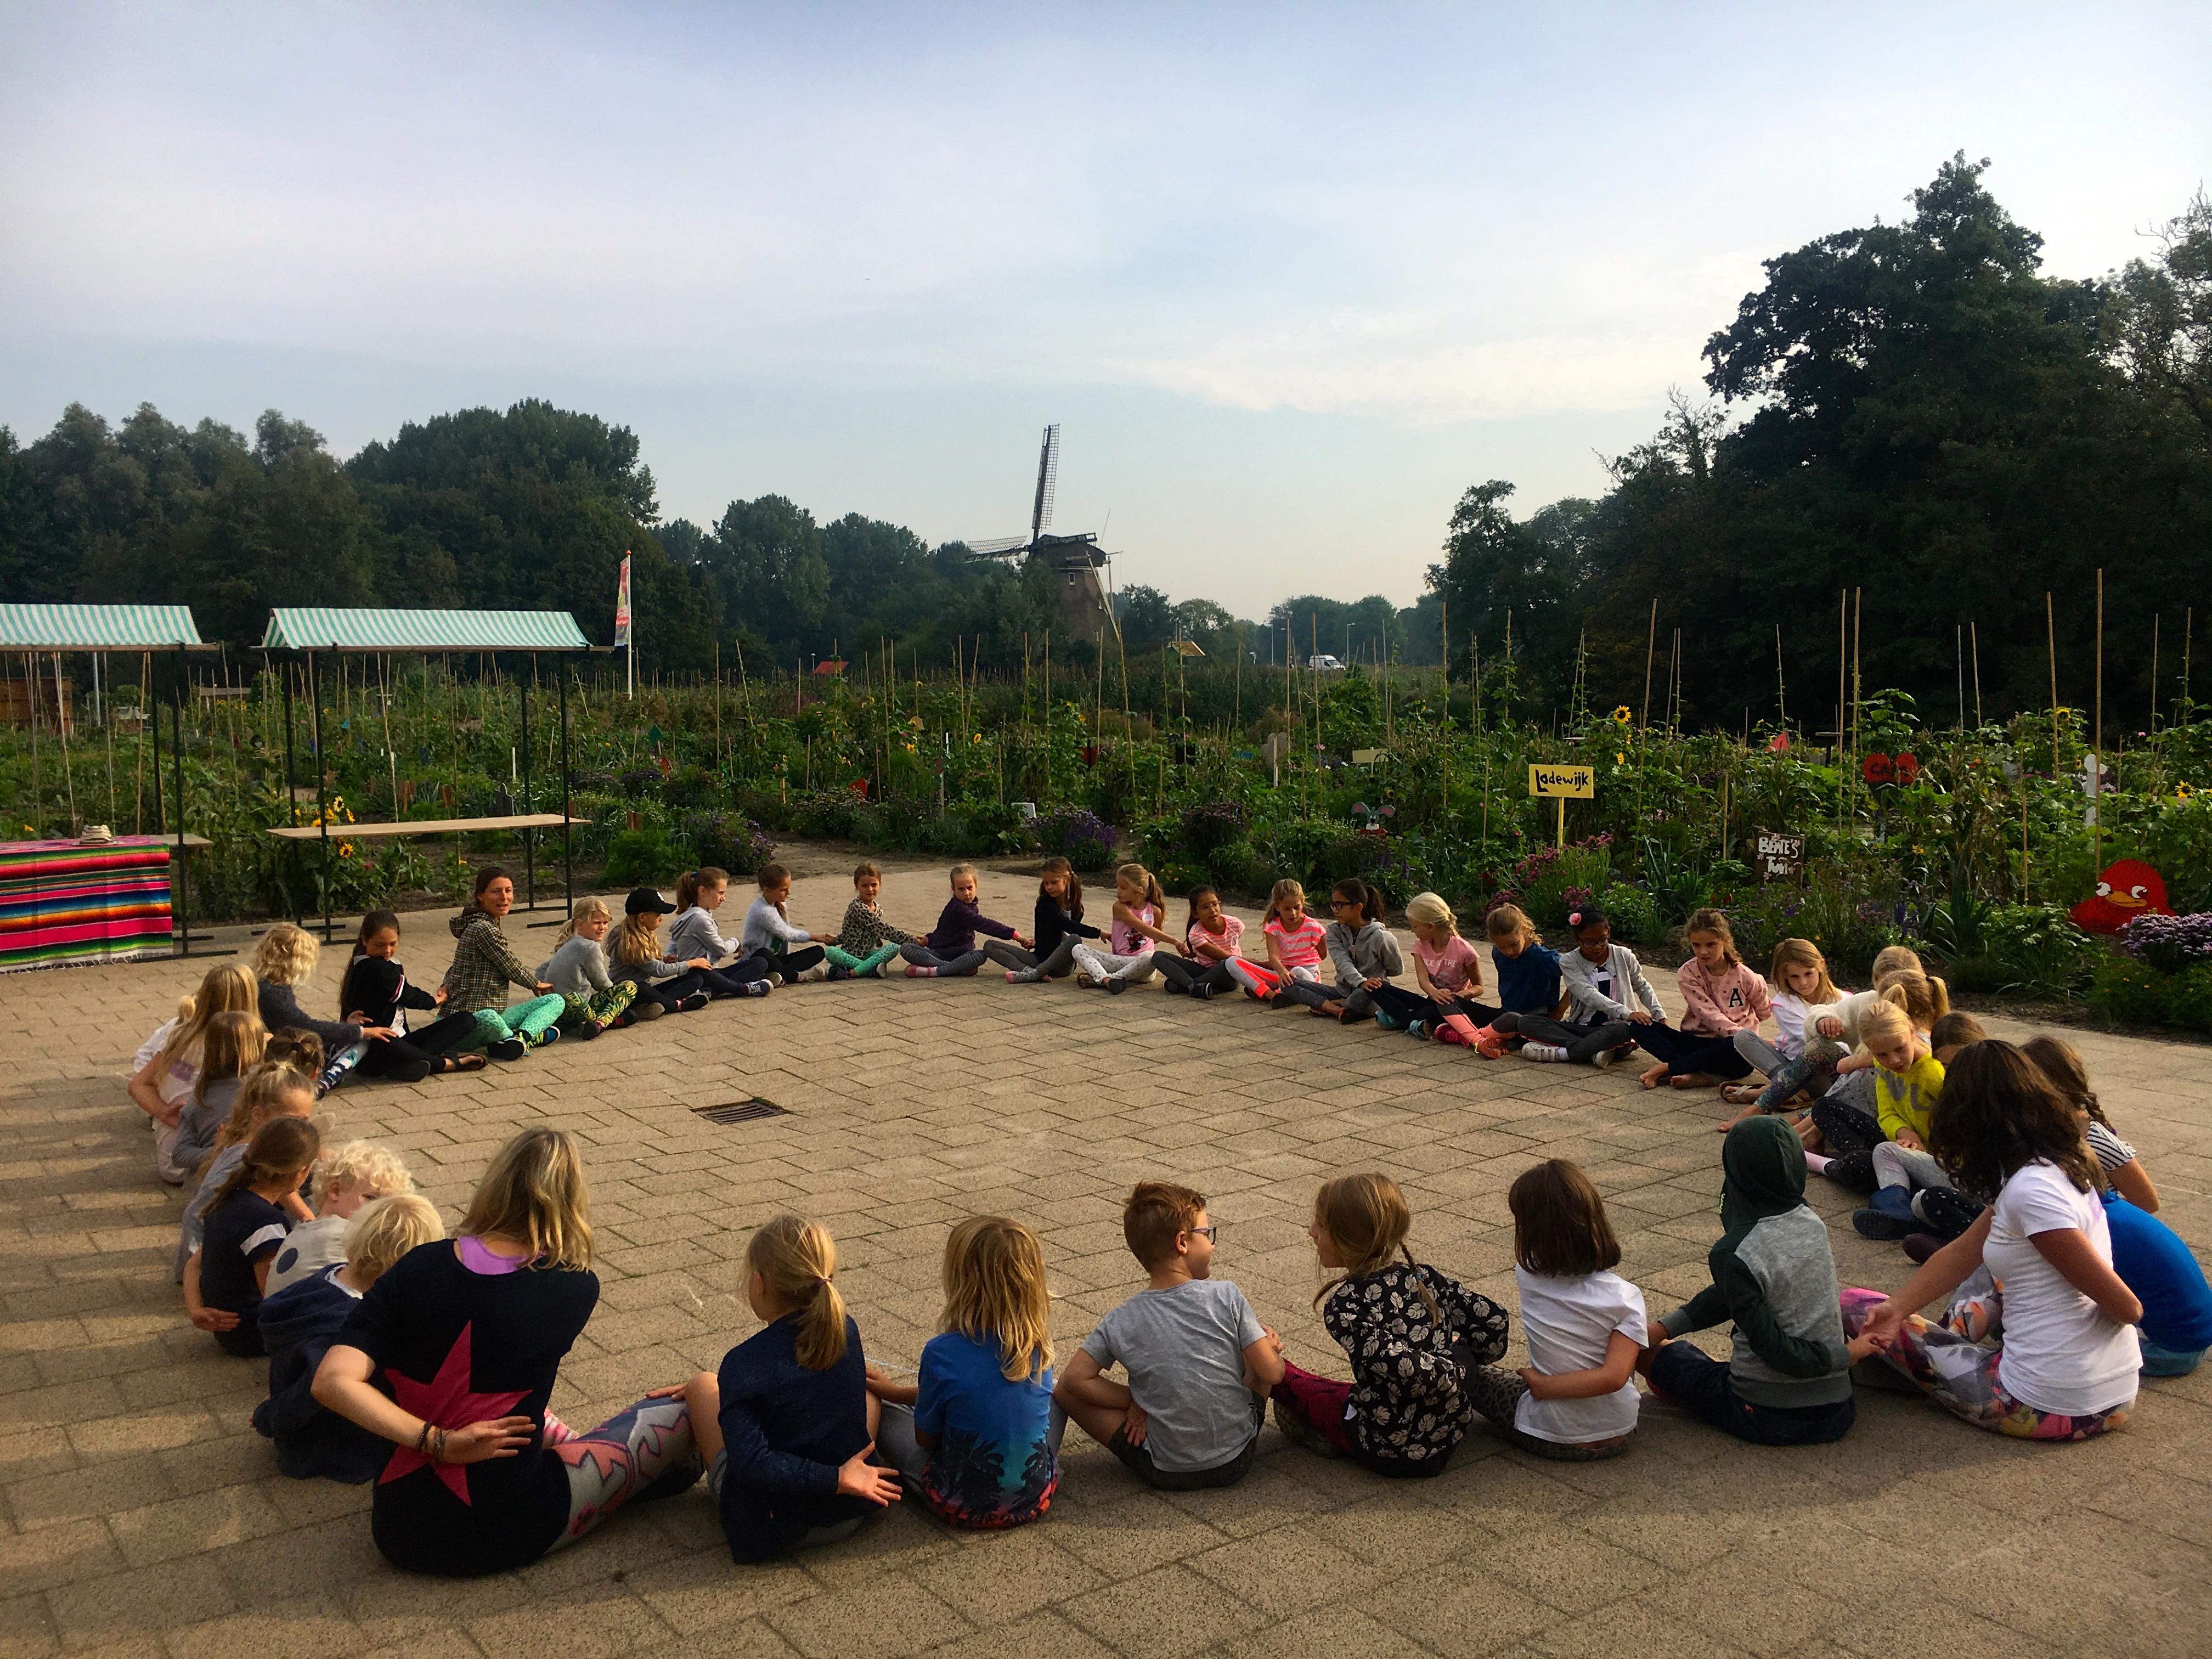 de Kinderyogatuin yogakamp zomerkamp kinderyoga - de twist - kinderyoga mindfulness meditatie massage buitenyoga Aemstel schooltuin Amsterdam Amstelveen